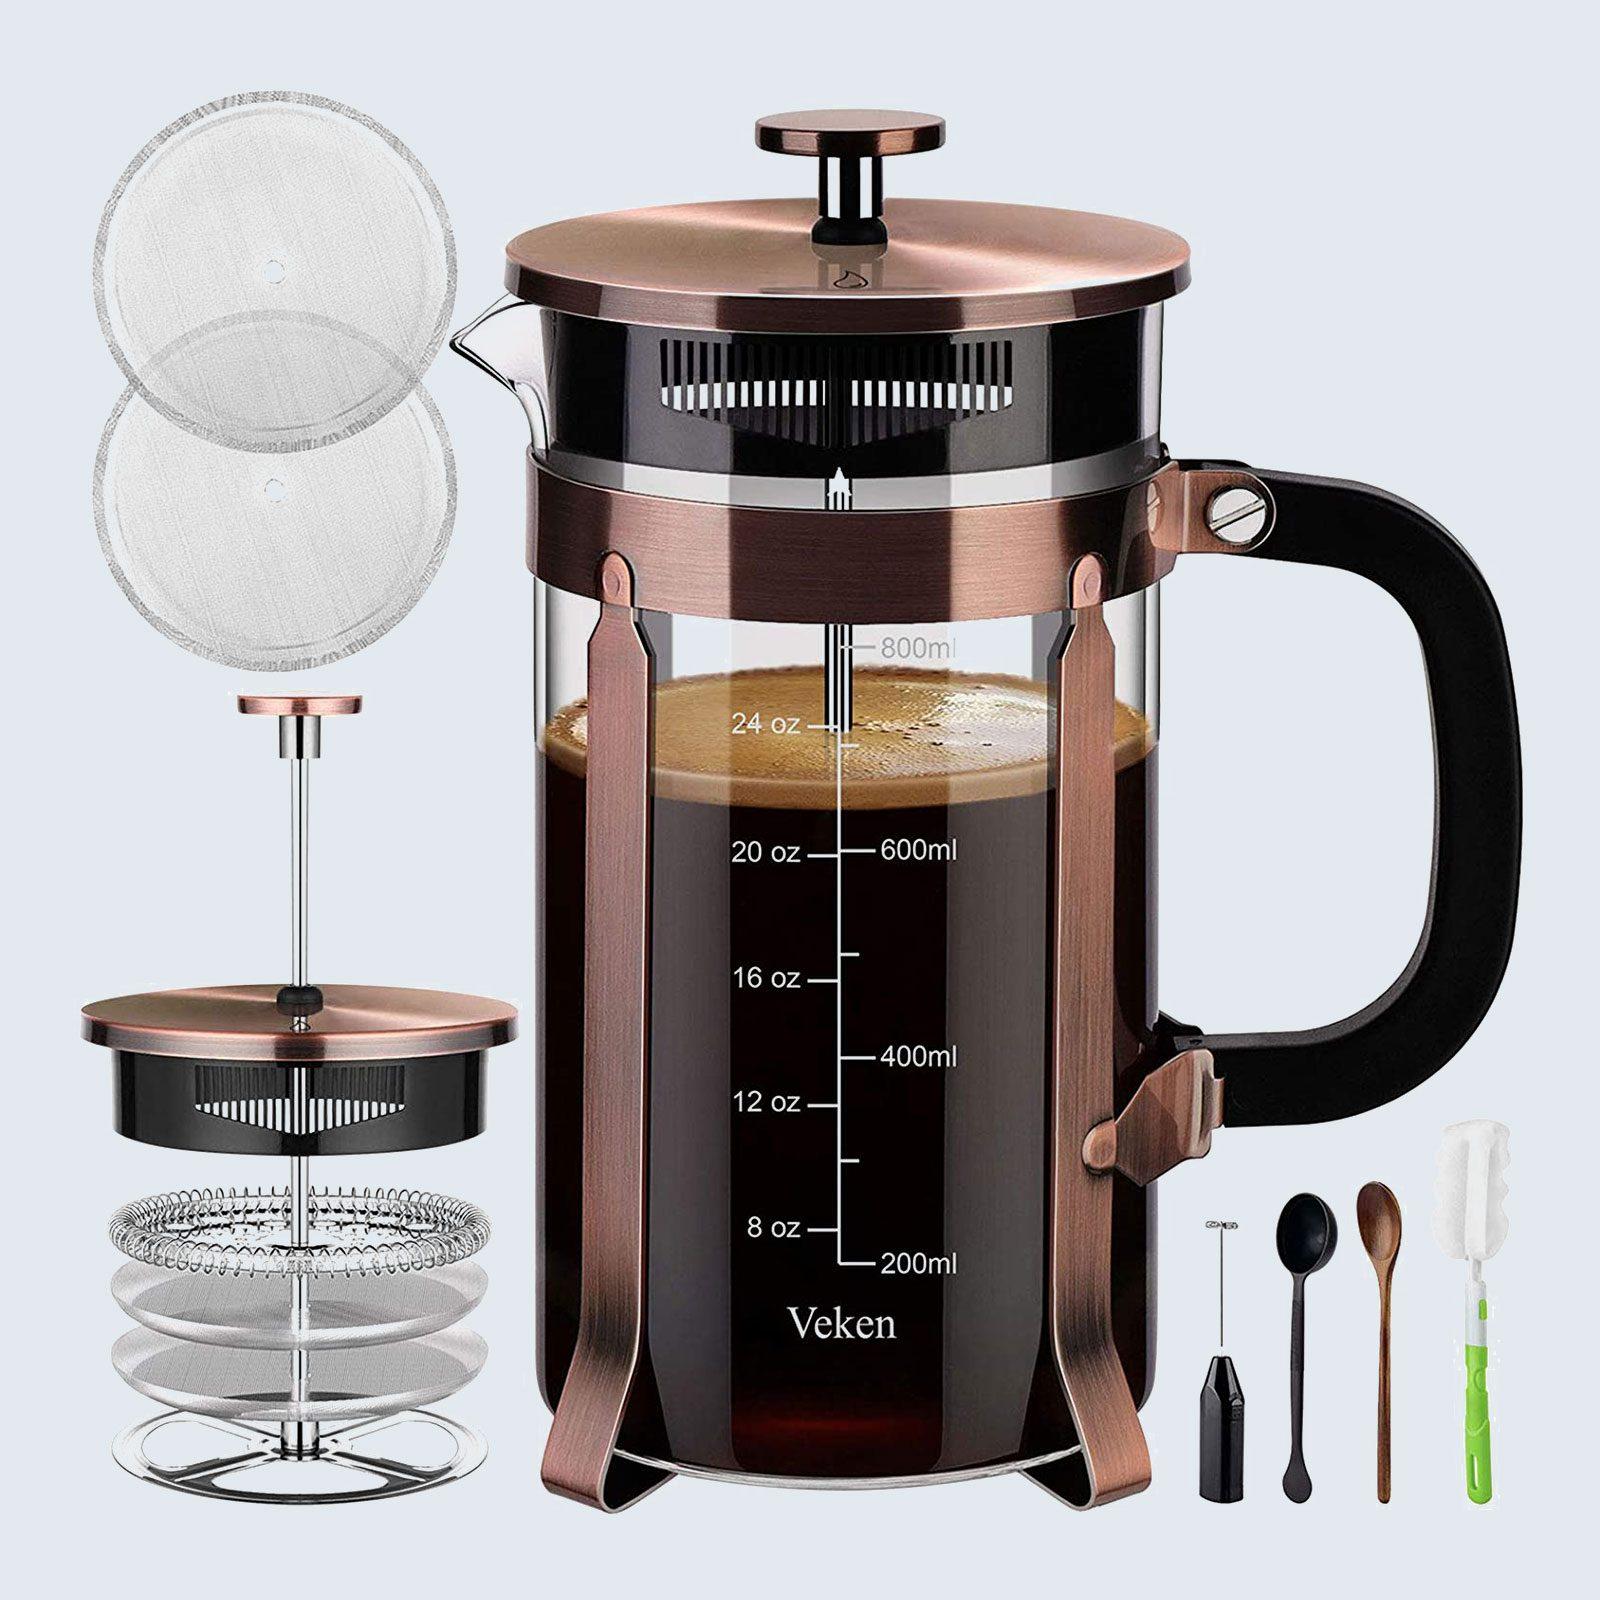 For the java lover: Veken French Press Coffee Maker